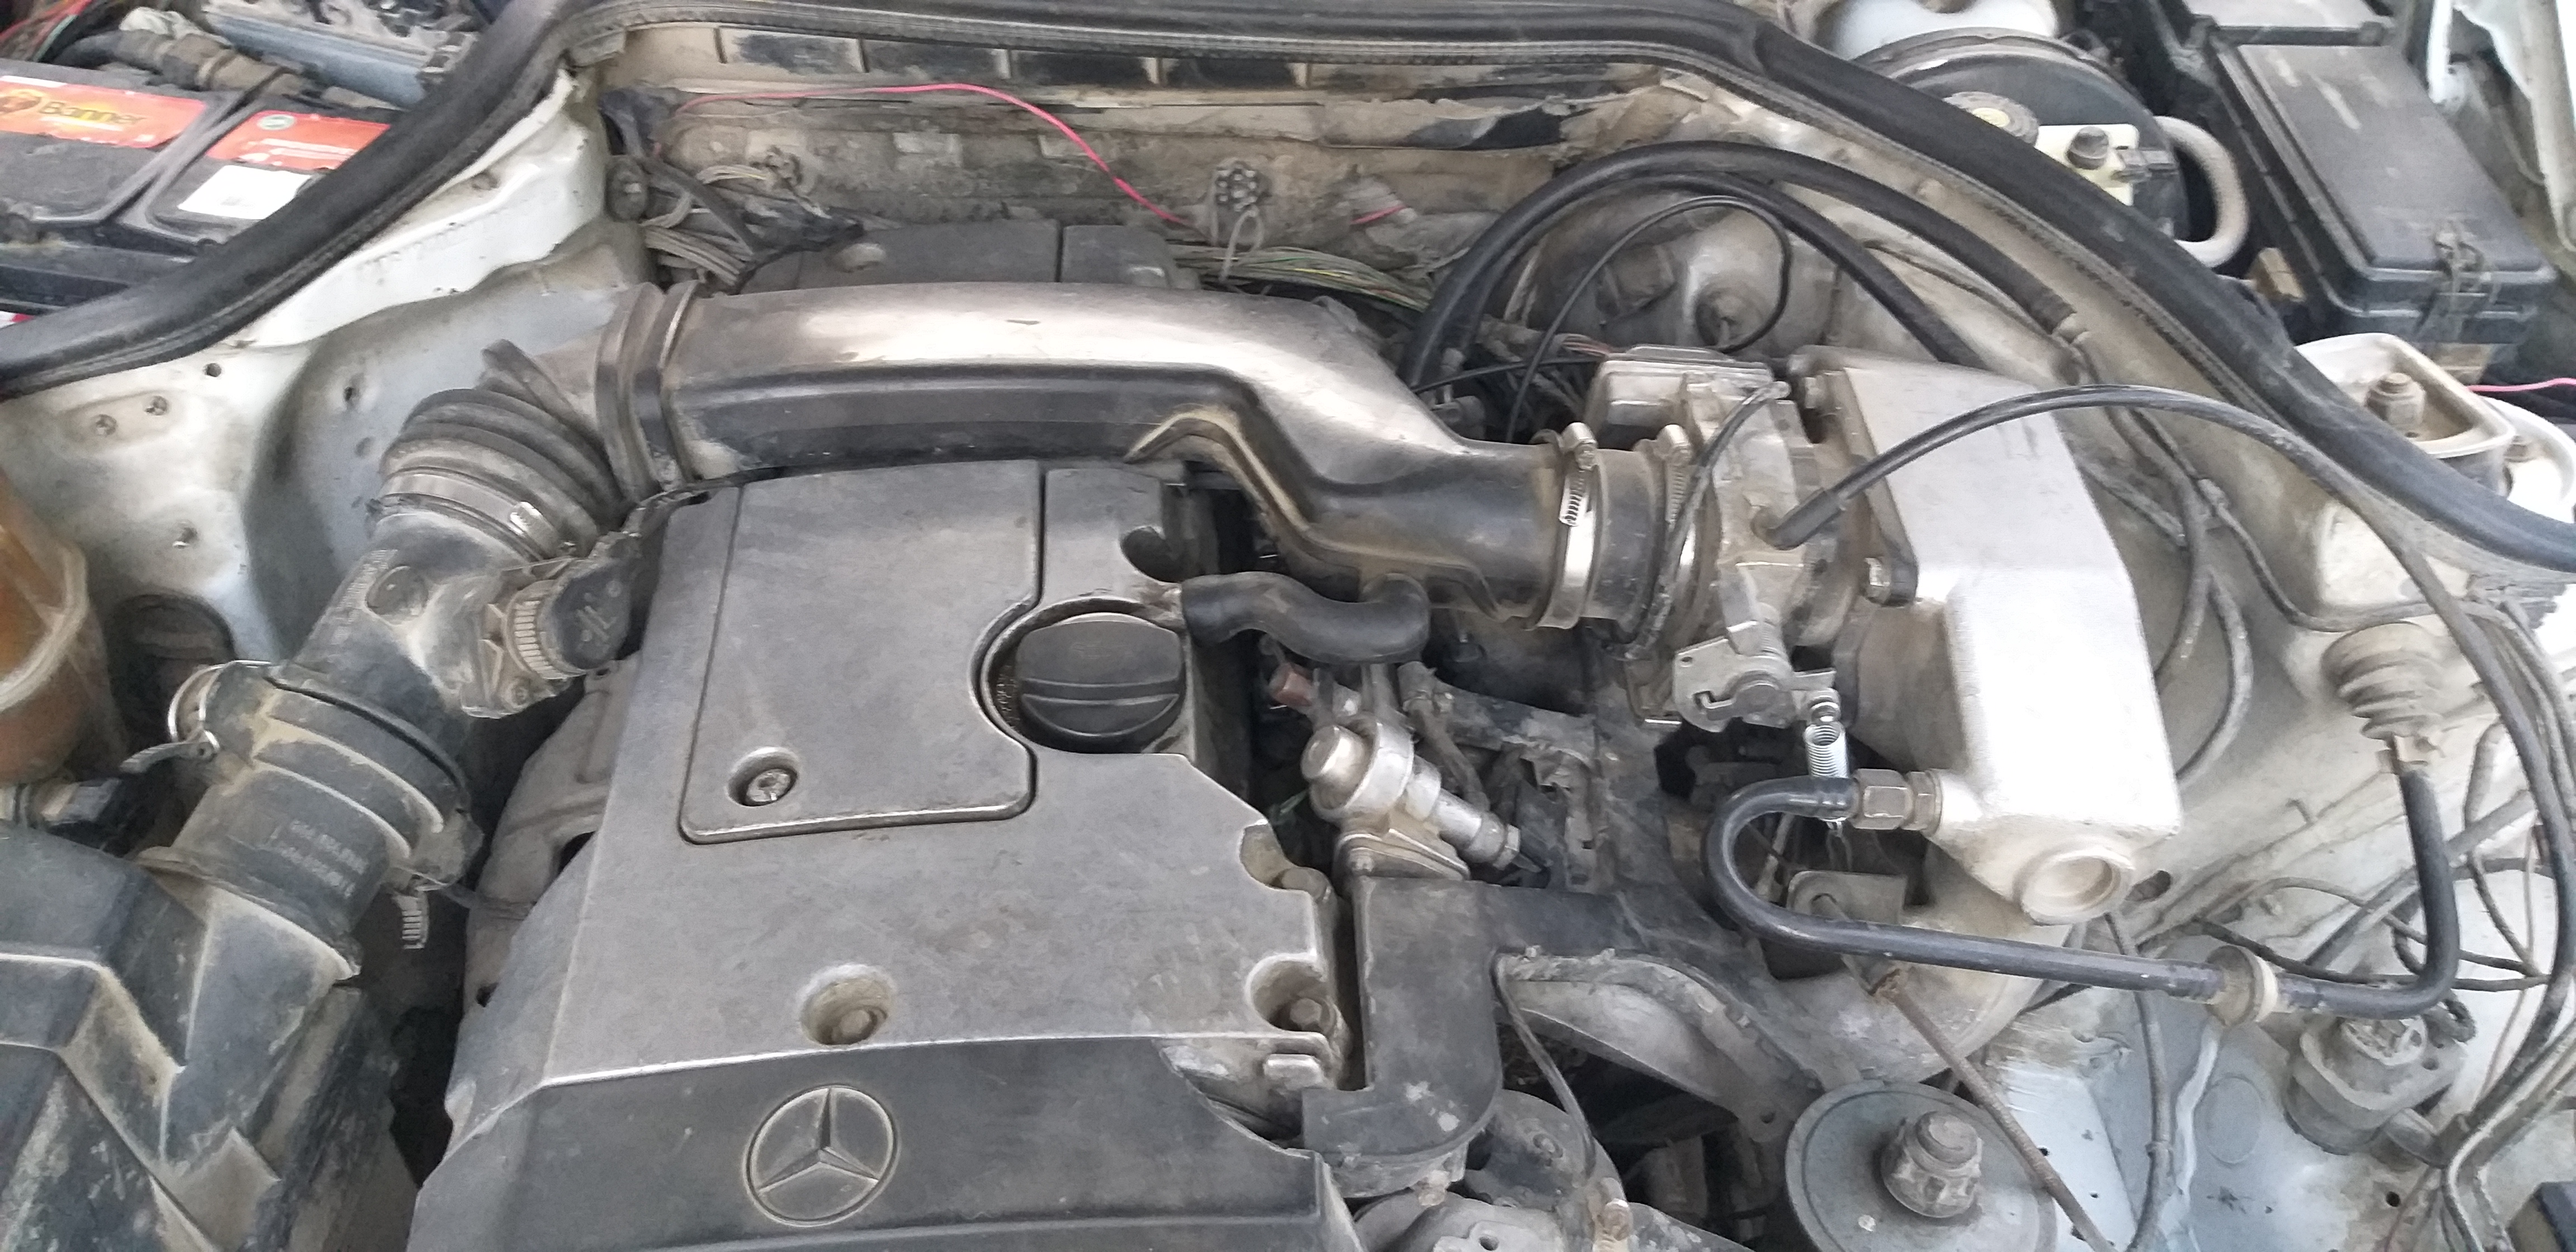 Mercedes-Benz E 220 2.2(lt) 1994 Подержанный  $6700